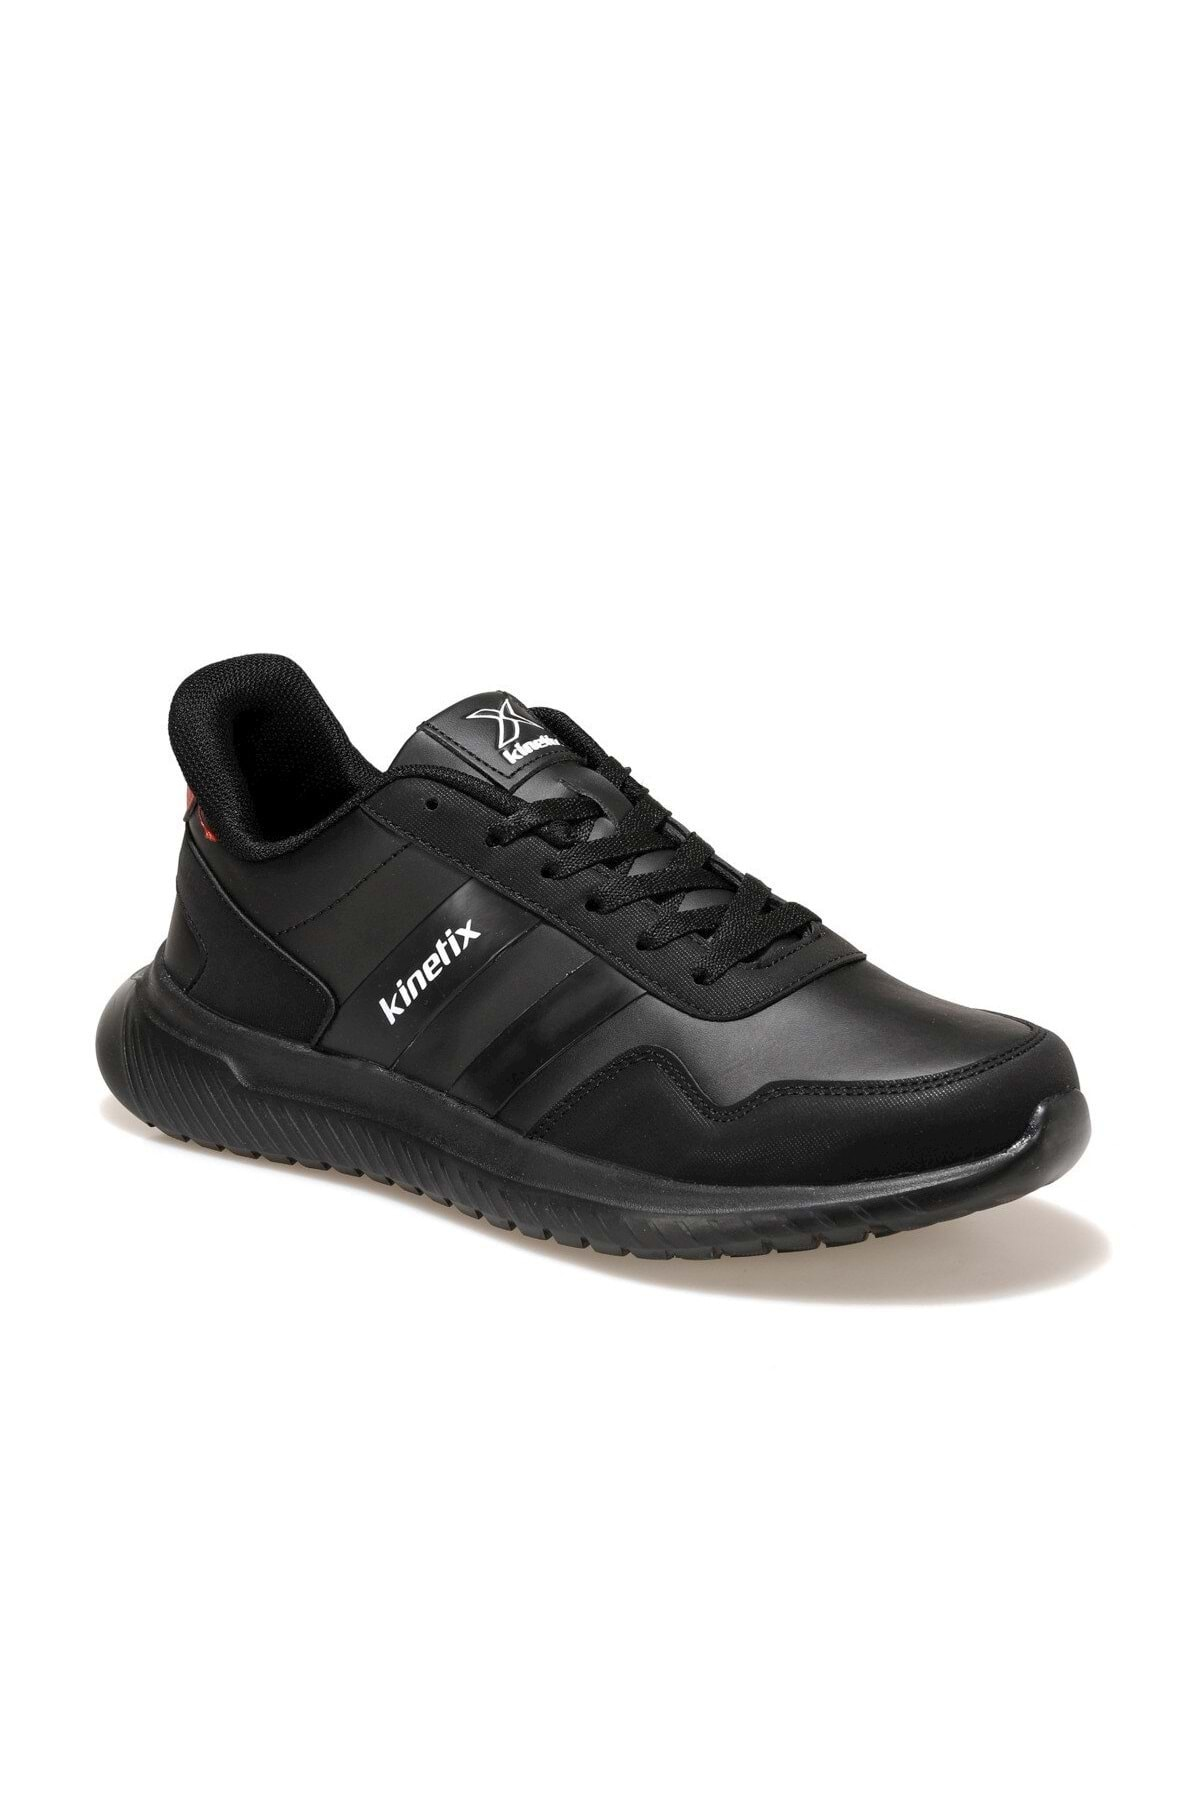 Kinetix ARINA PU M Siyah Erkek Çocuk Koşu Ayakkabısı 100536602 1